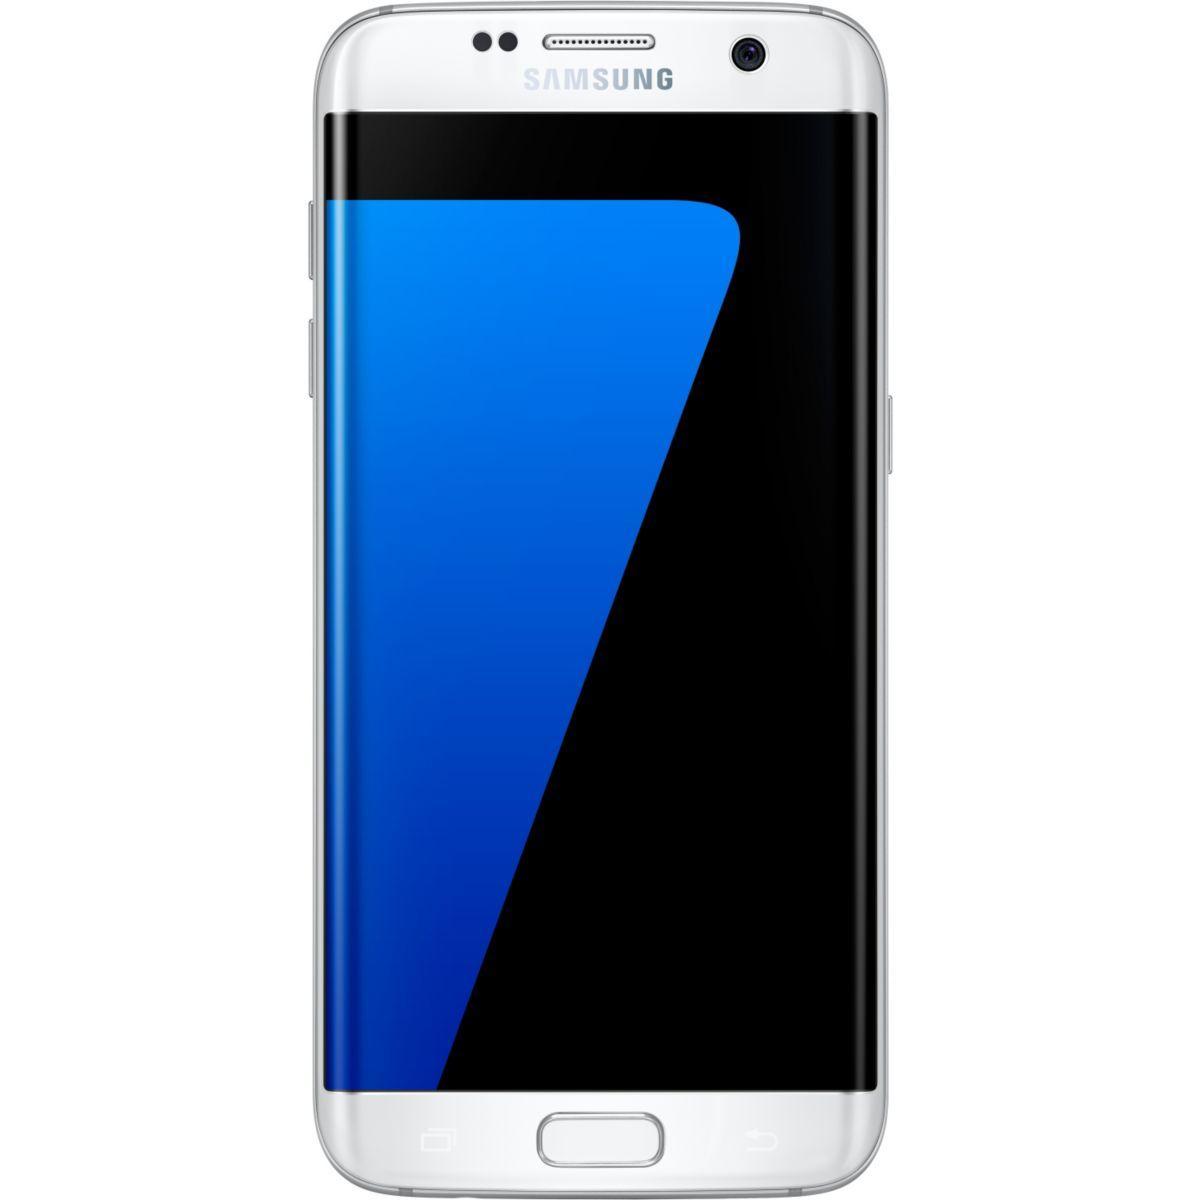 Pack promo smartphone samsung galaxy s7 edge 32go blanc + etui samsung s view cover galaxy s7 edge blanc - soldes et bonnes affaires à prix imbattable